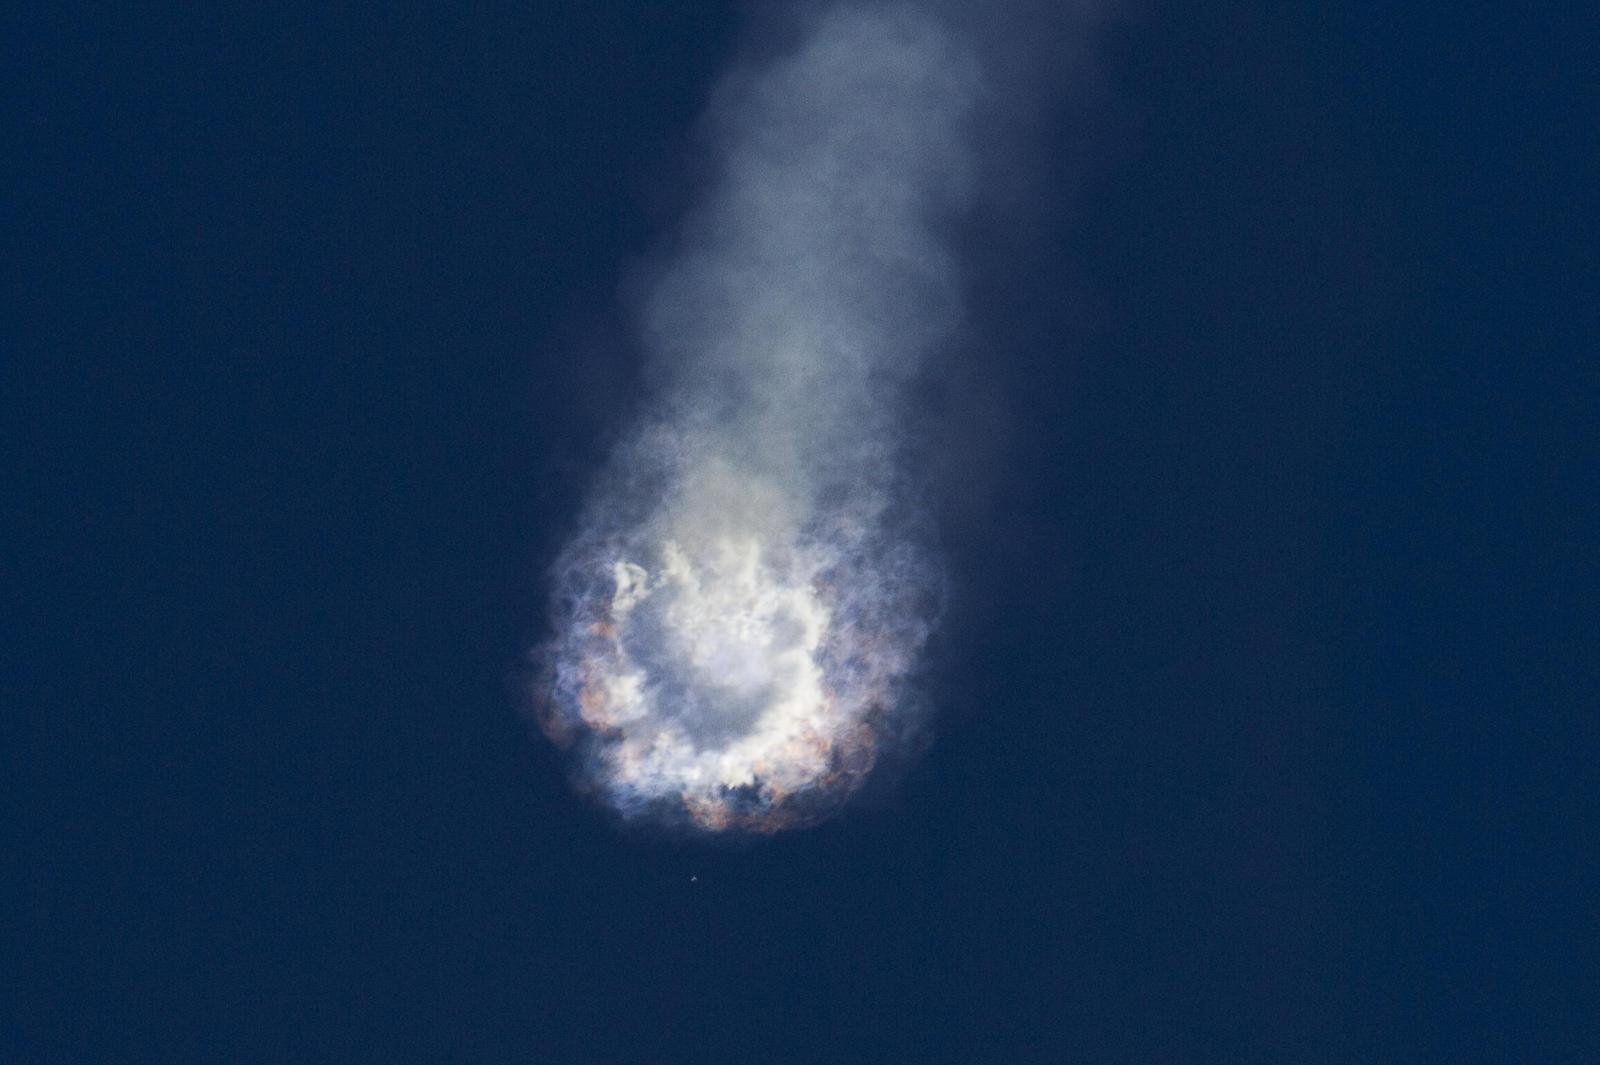 Výbuch rakety společnosti SpaceX